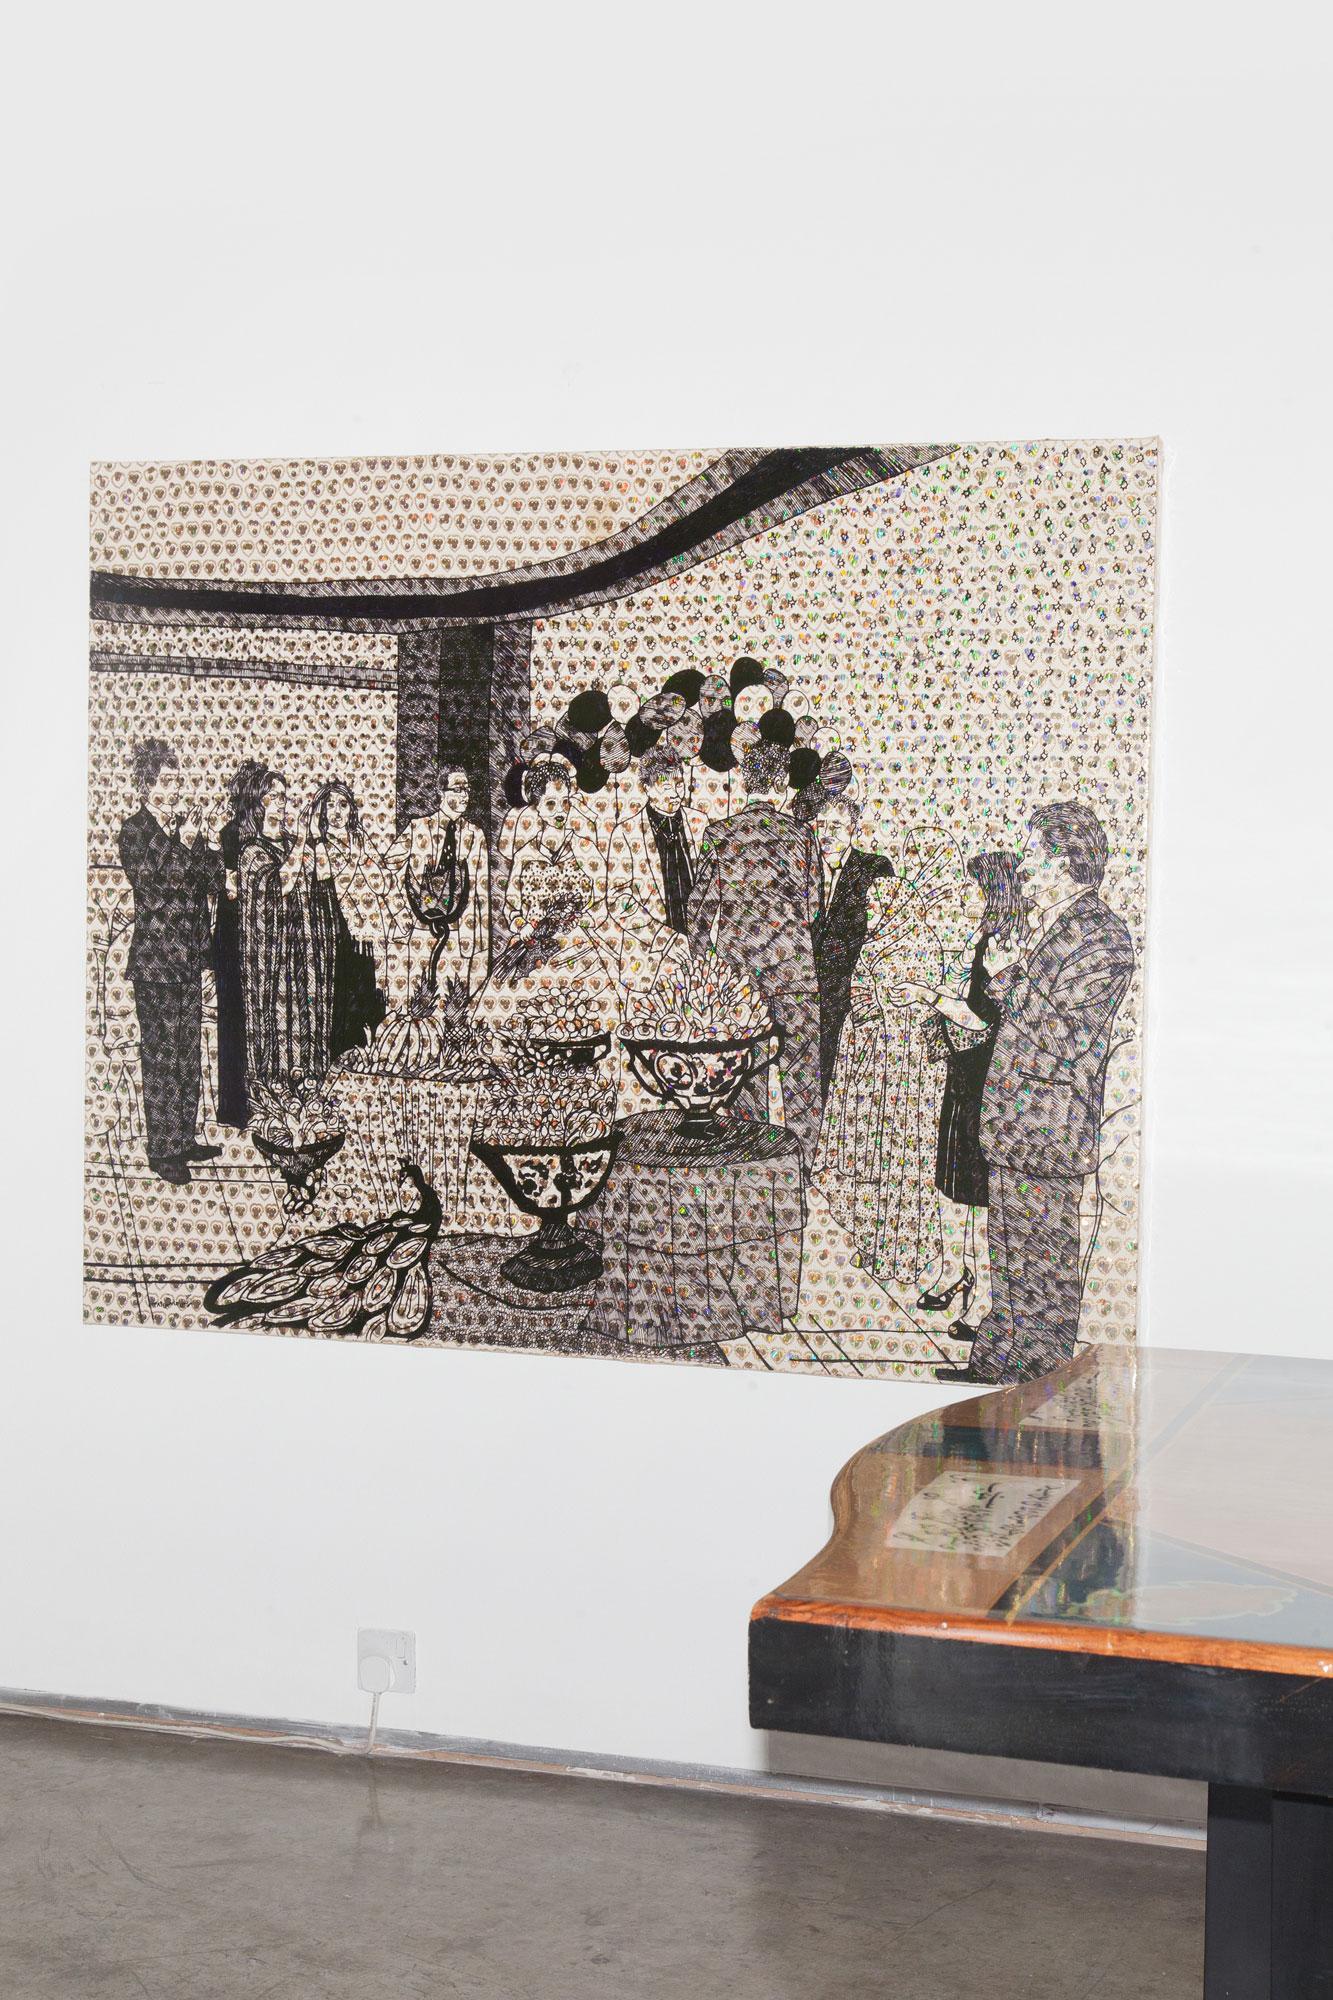 Gallery Isabelle van den Eynde /Untitled /byNargess Hashemi